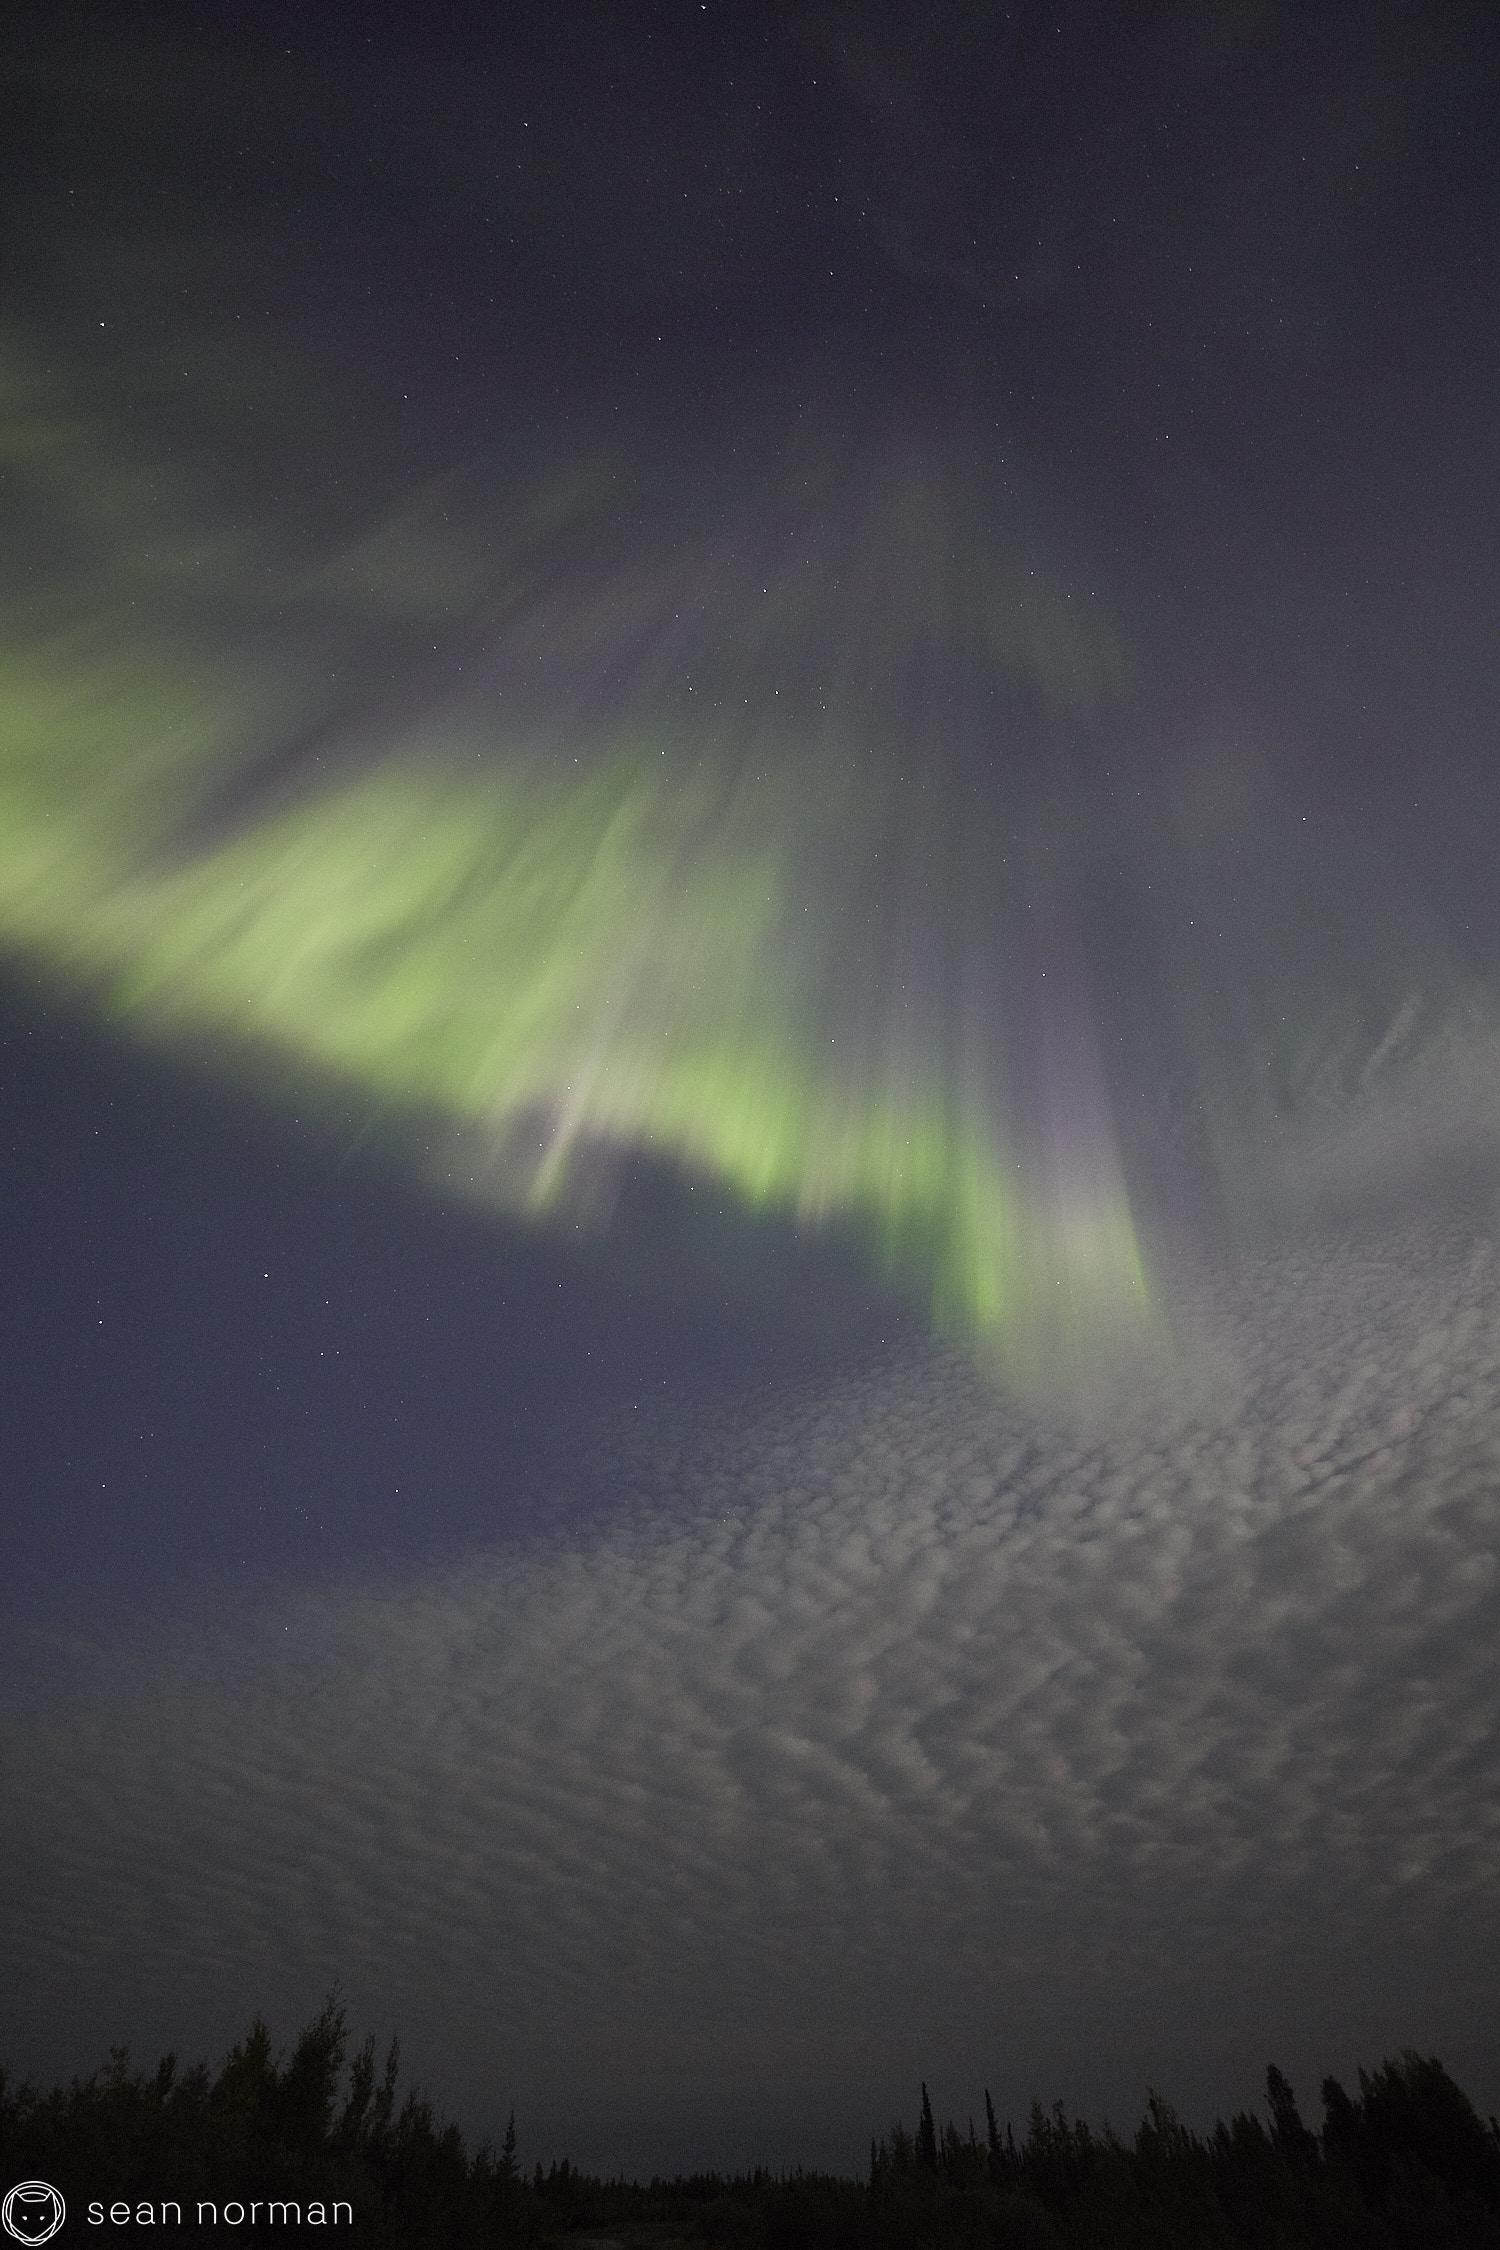 Best Place to See Aurora - Yellowknife Canada Aurora Tour - 13.jpg